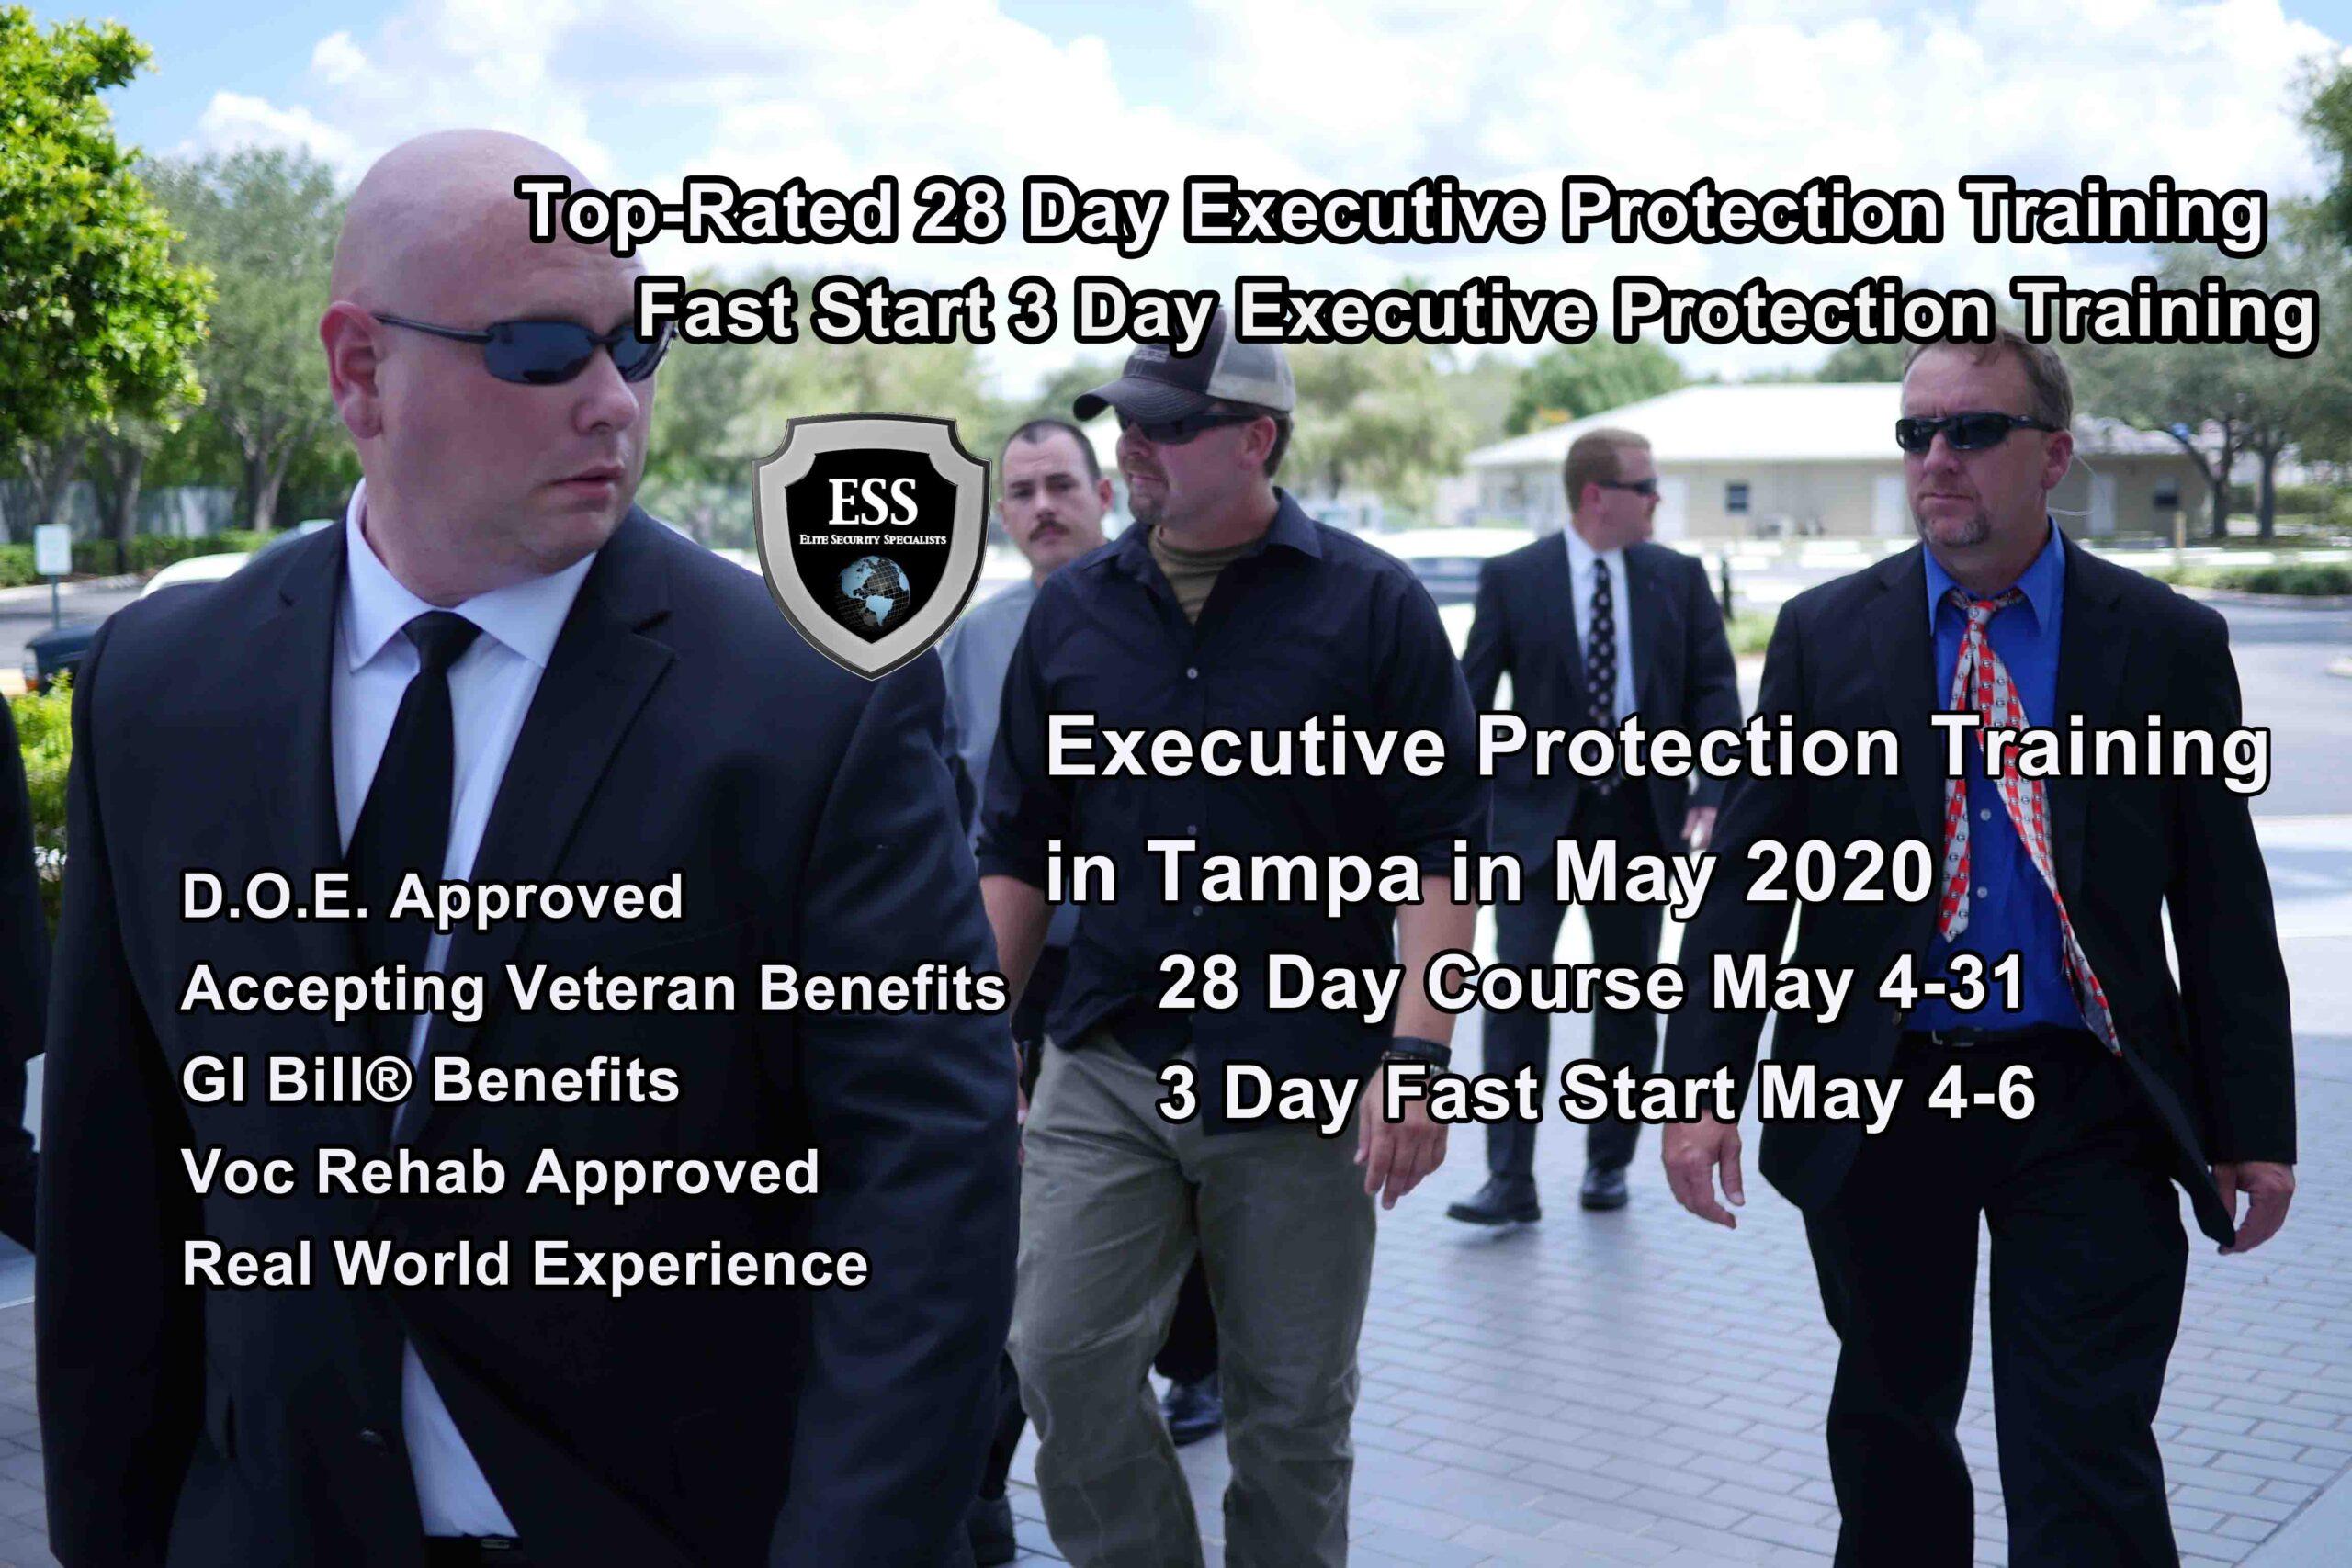 Executive Protection Training - Tampa MAY